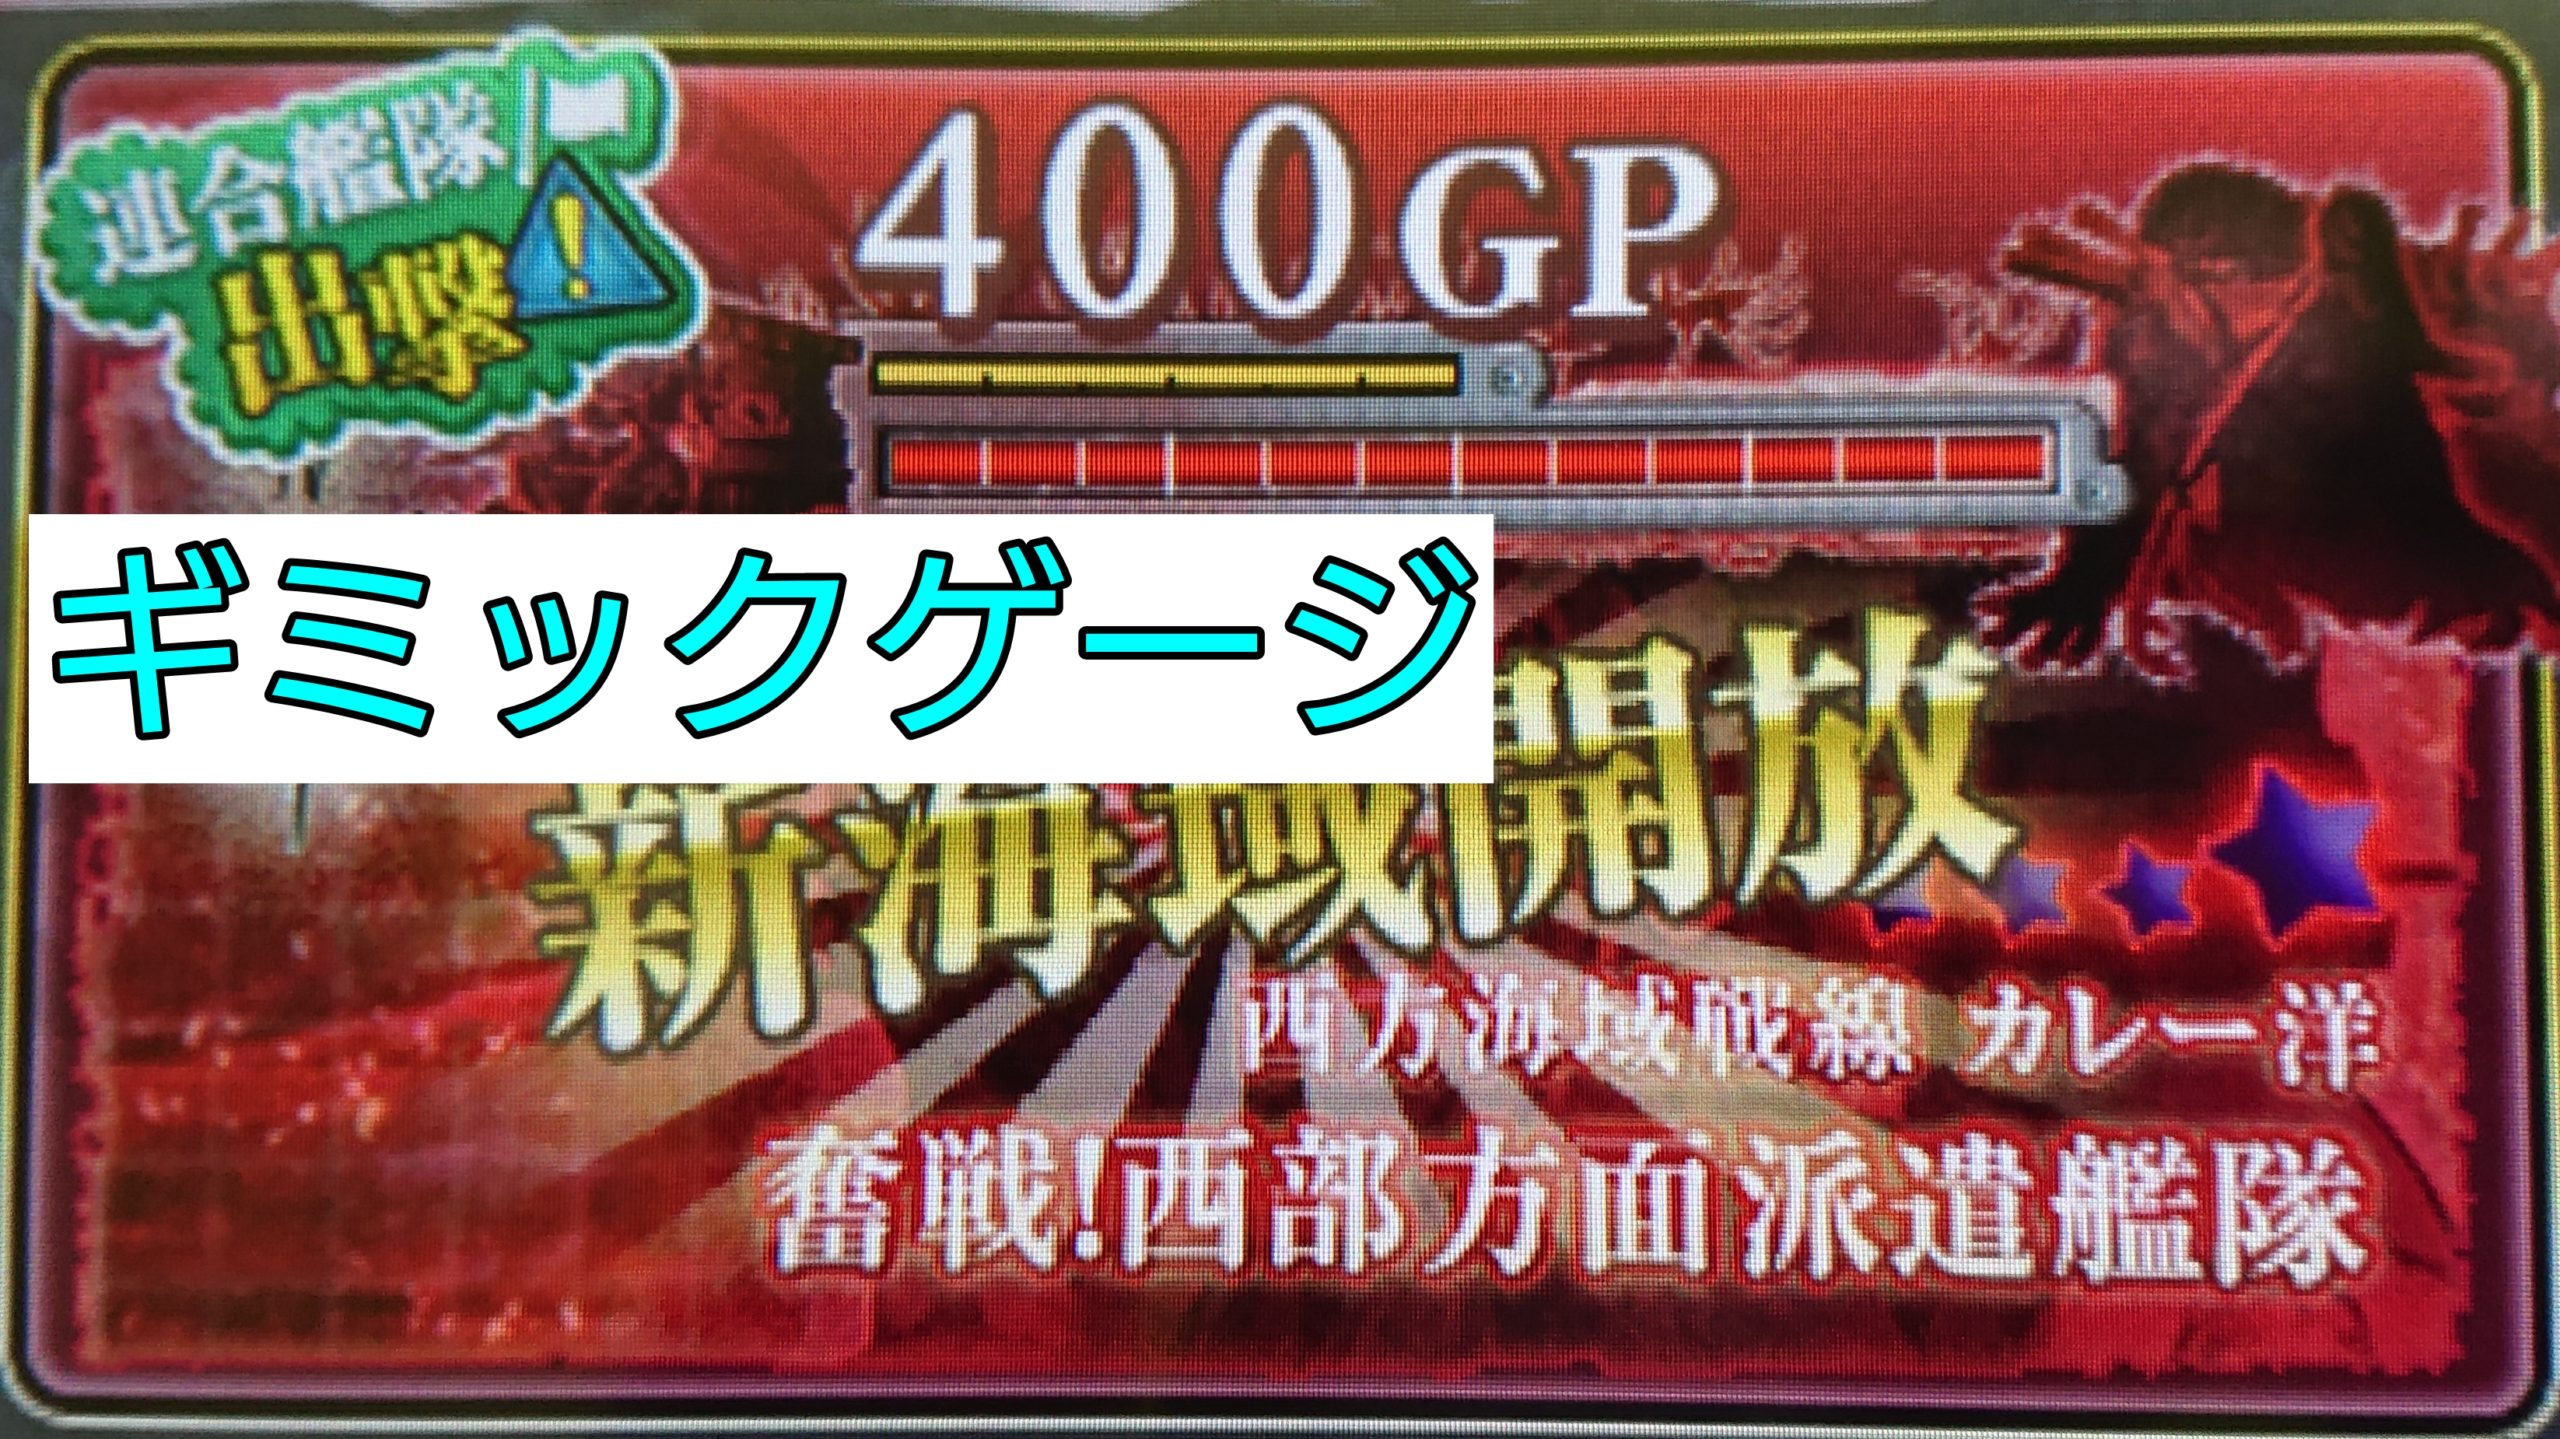 【AC】E4-1 奮戦!西部方面派遣艦隊(甲作戦)ギミックゲージ攻略